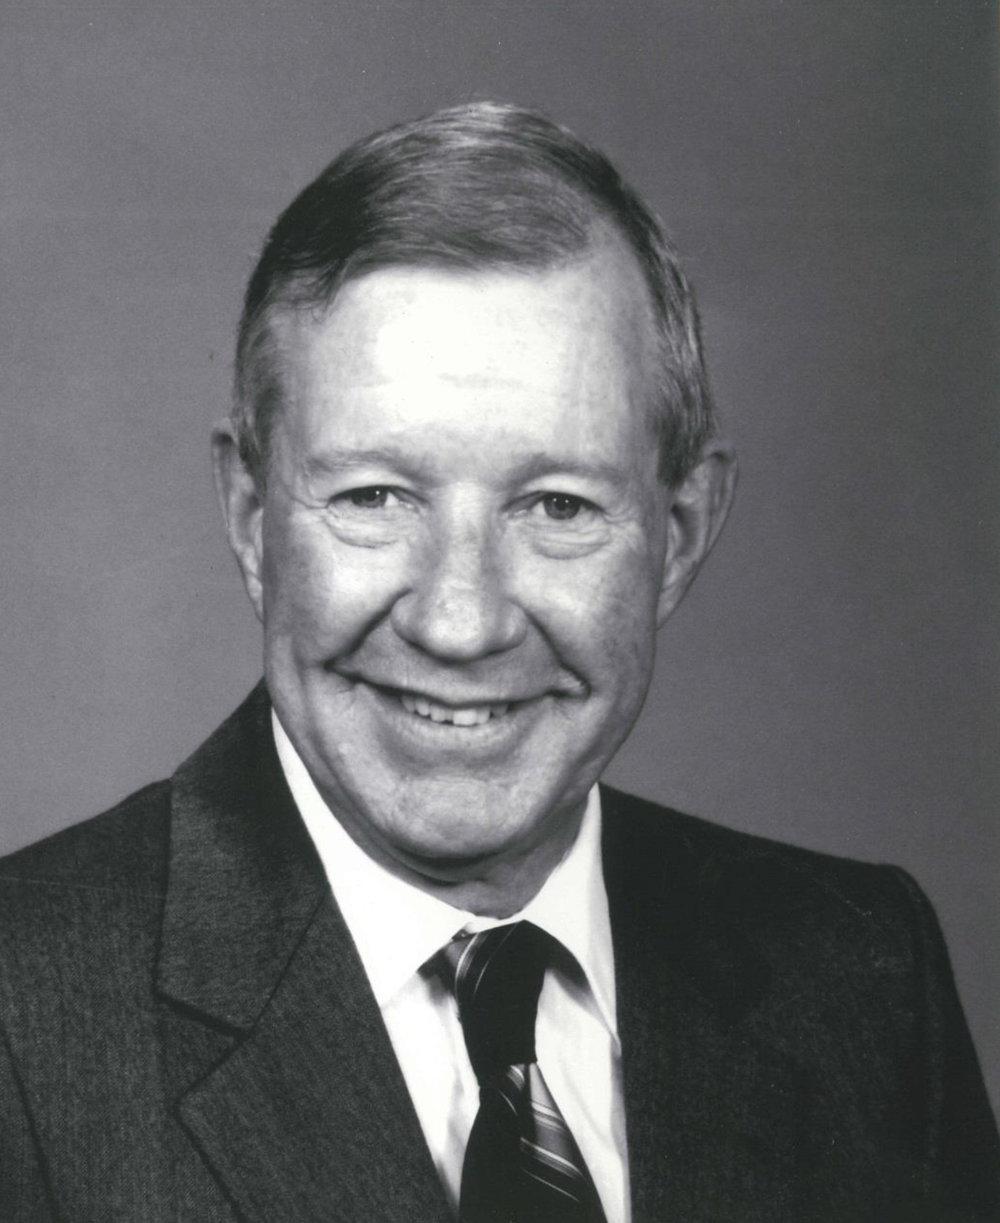 HOWARD E. RUSSELL